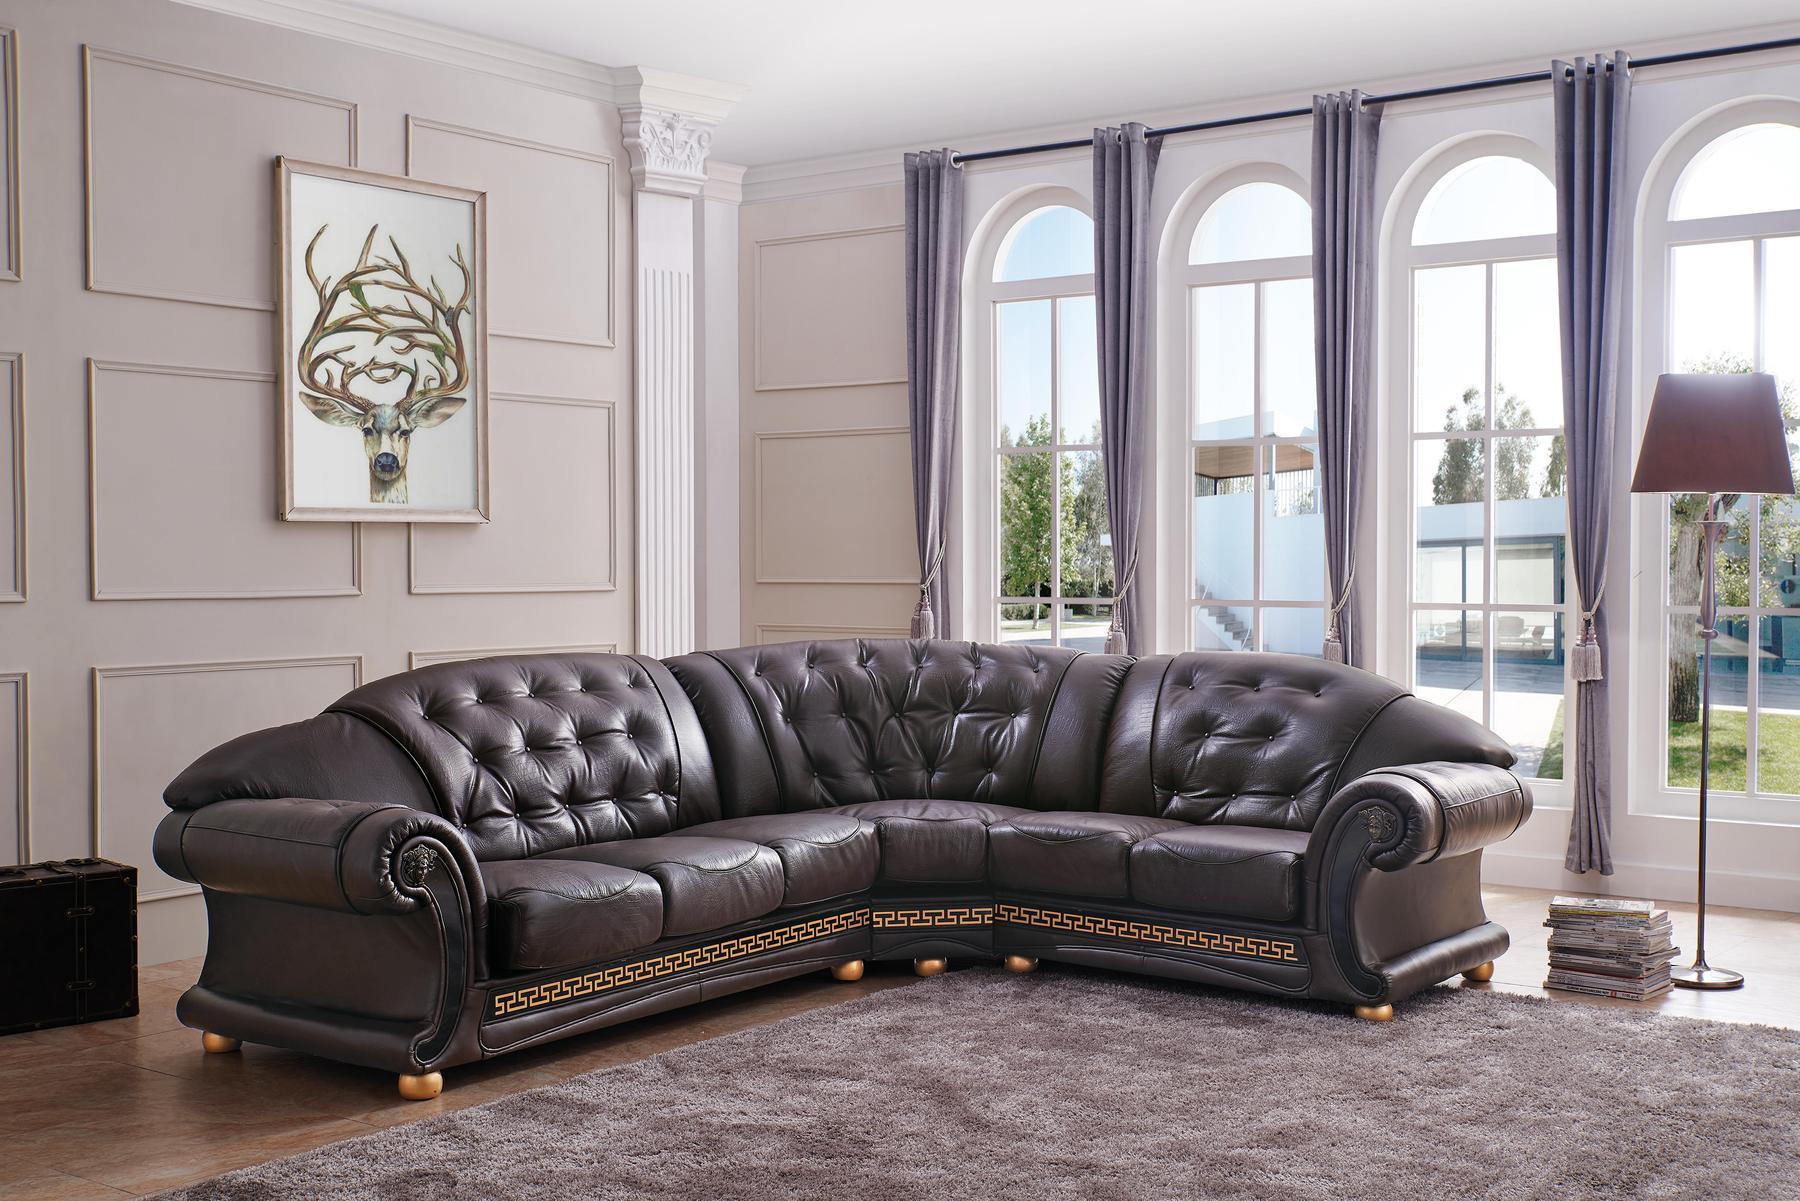 Incredible Versace Rf Brown Sectional Sofa Uwap Interior Chair Design Uwaporg